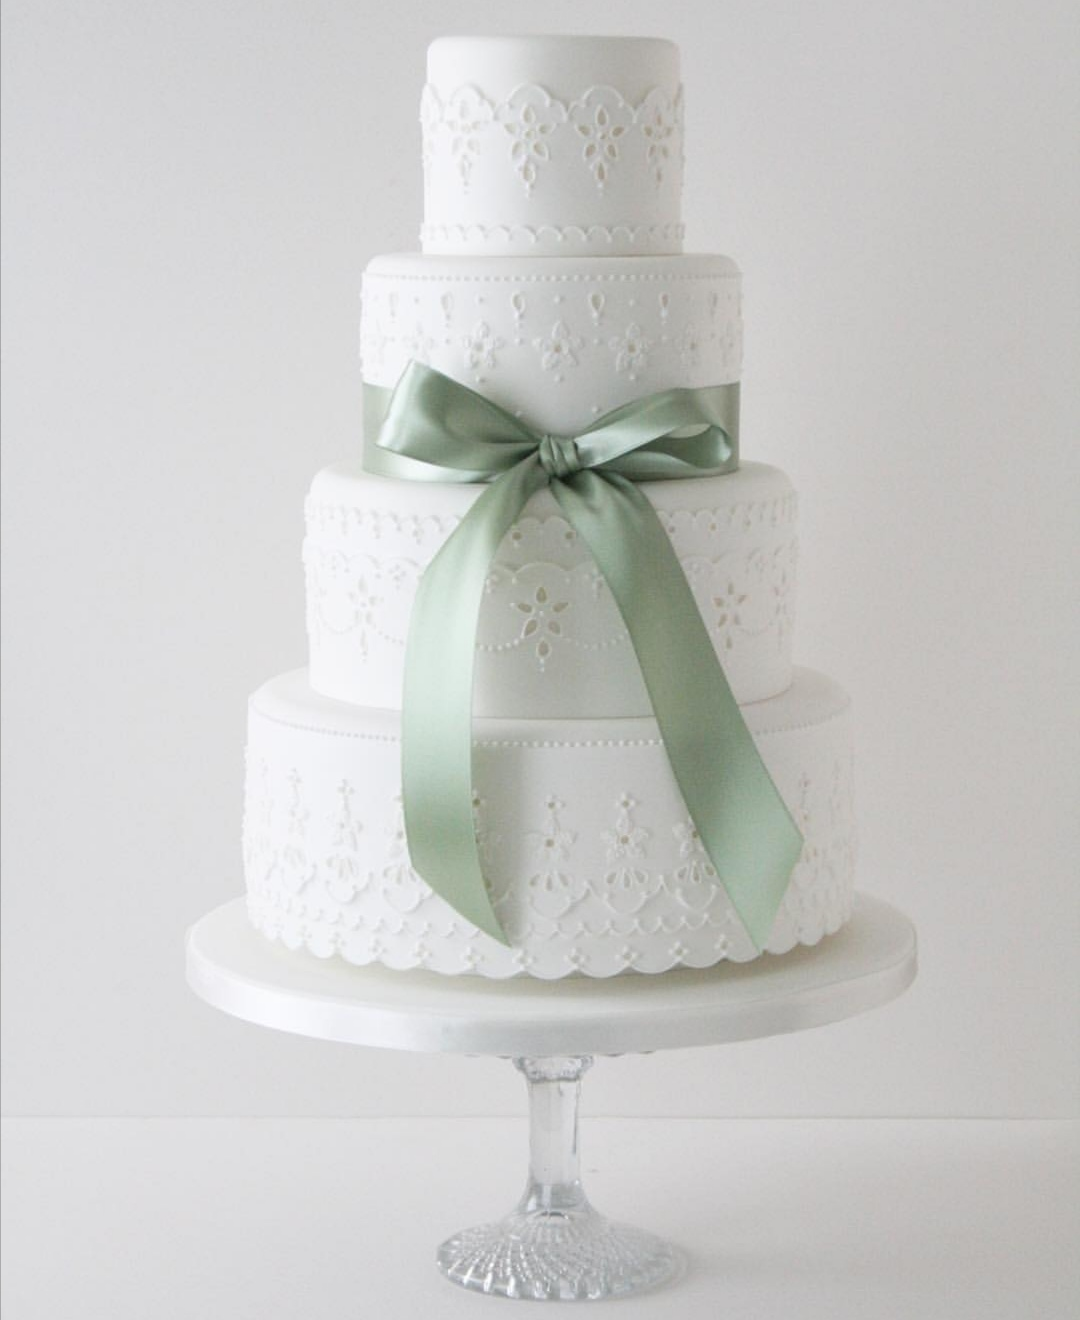 Sage Green and white wedding cake